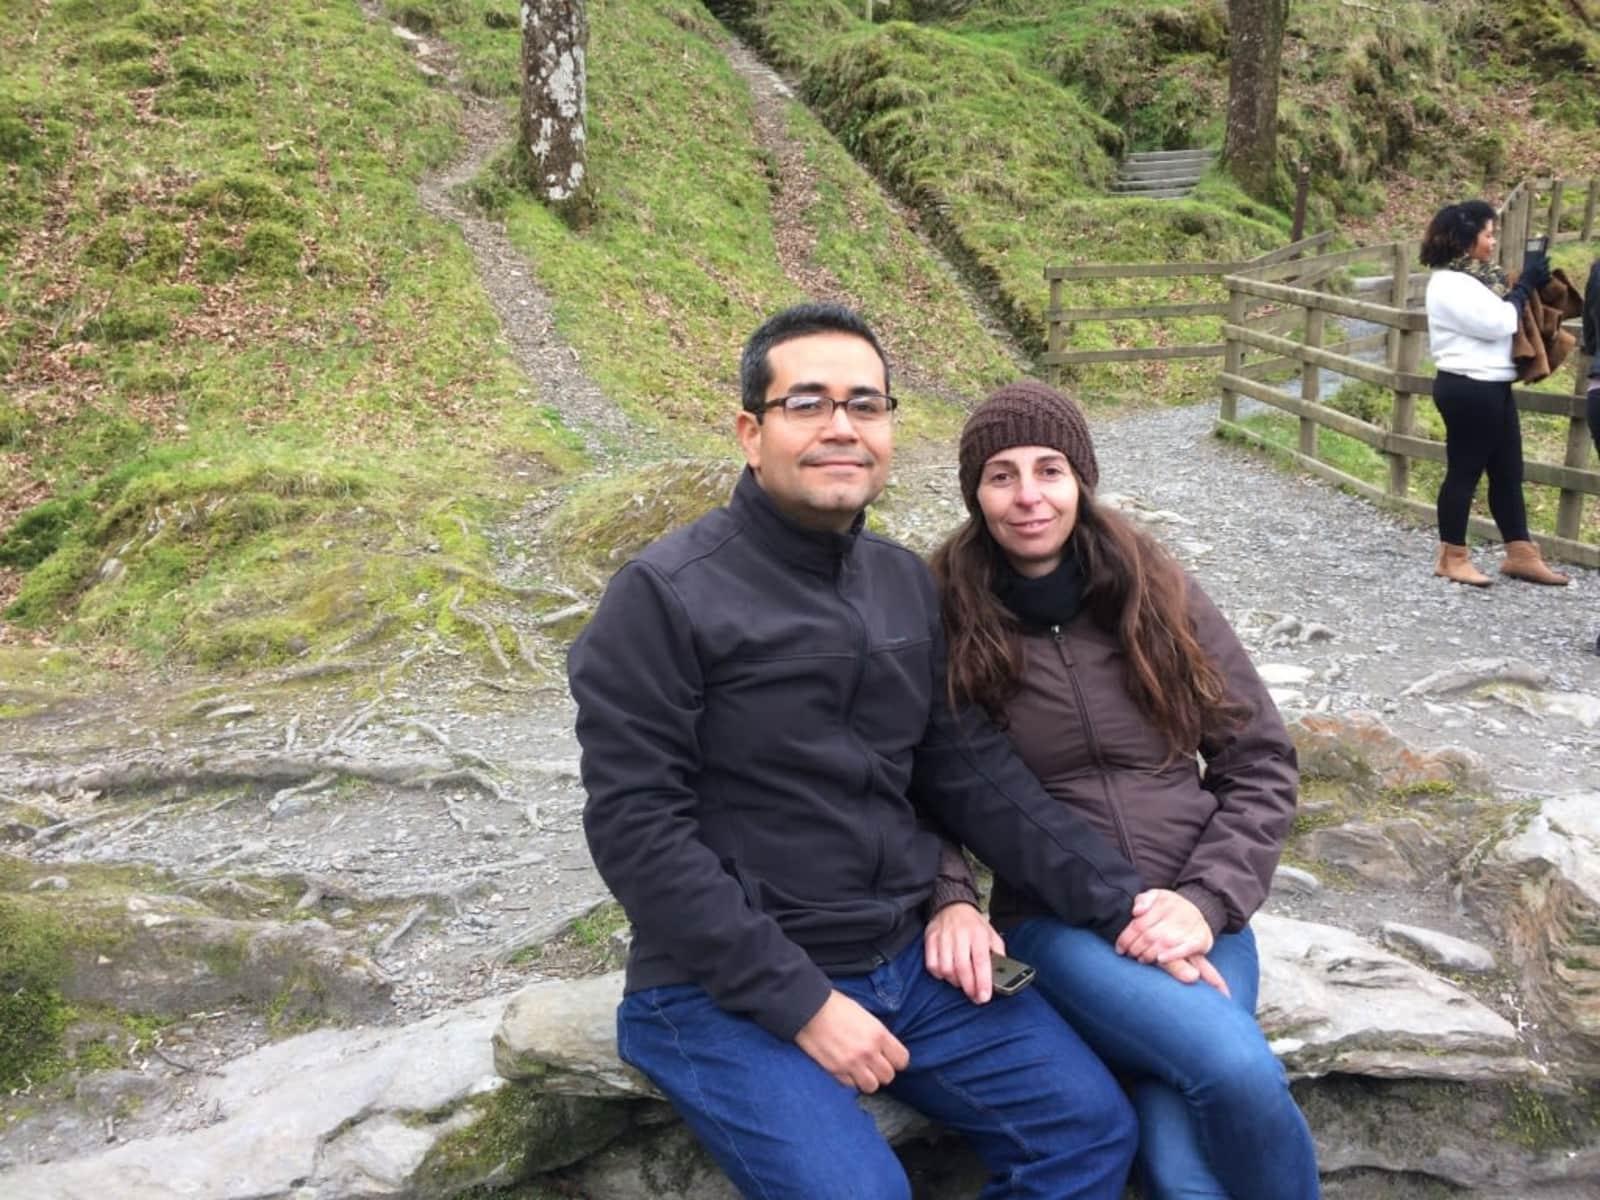 Roberto & Carla from Dublin, Ireland